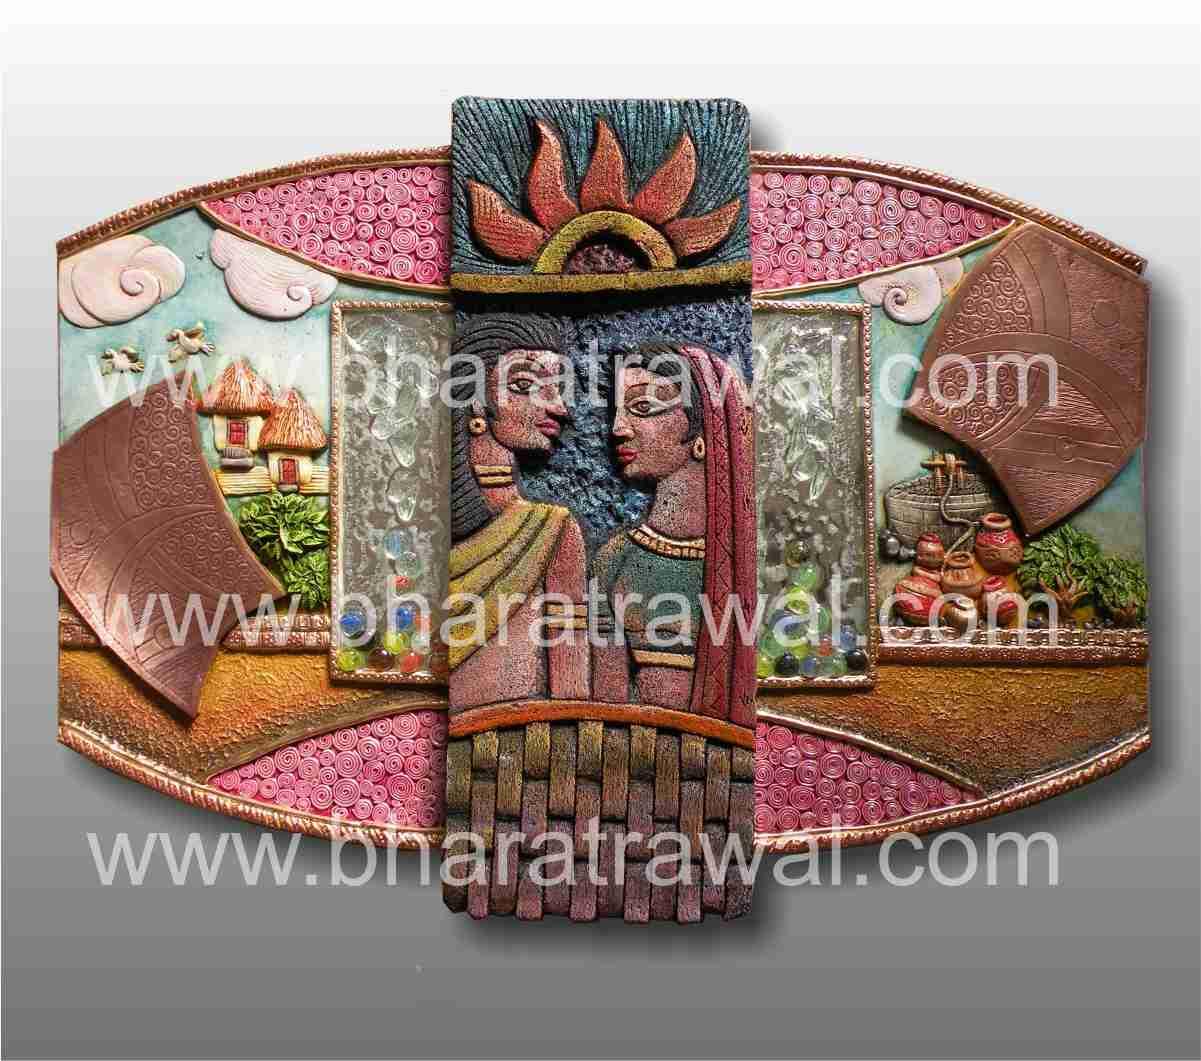 http://1.bp.blogspot.com/-NKH2VD5e964/T4cILCOnfrI/AAAAAAAAAJs/199yM8EWYjo/s1600/siporex_ceramic_mixmedia_mural_art%2B05.jpg